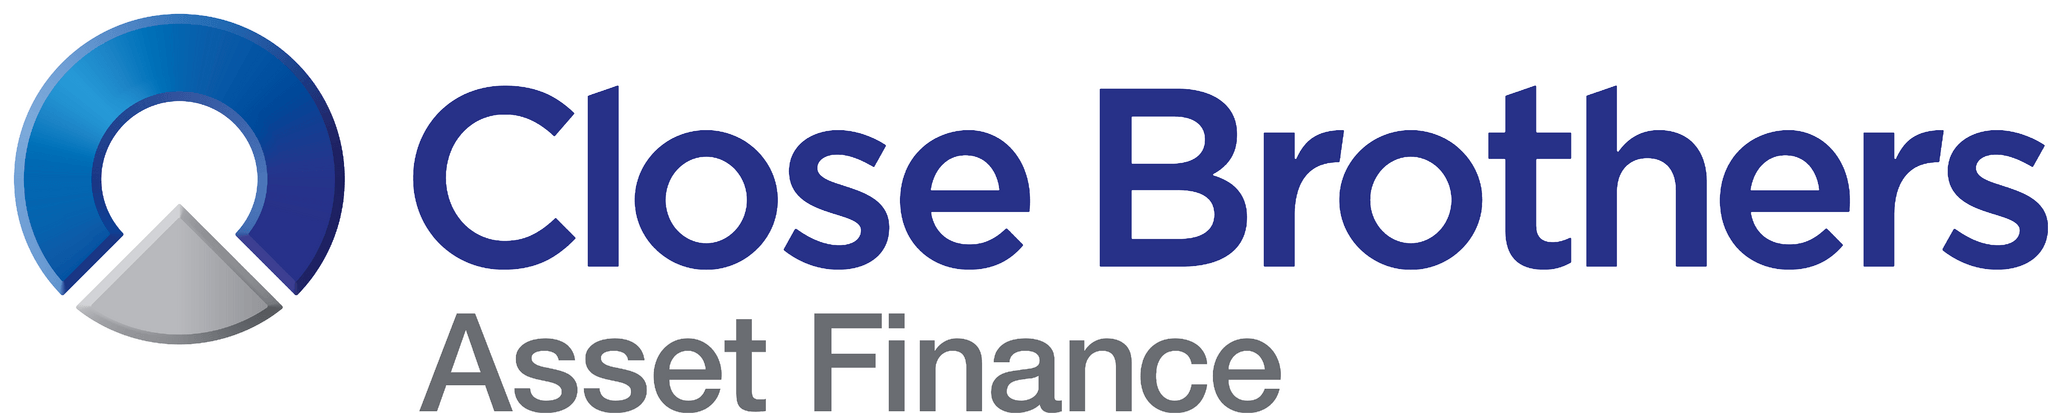 Close Brothers Asset Finance